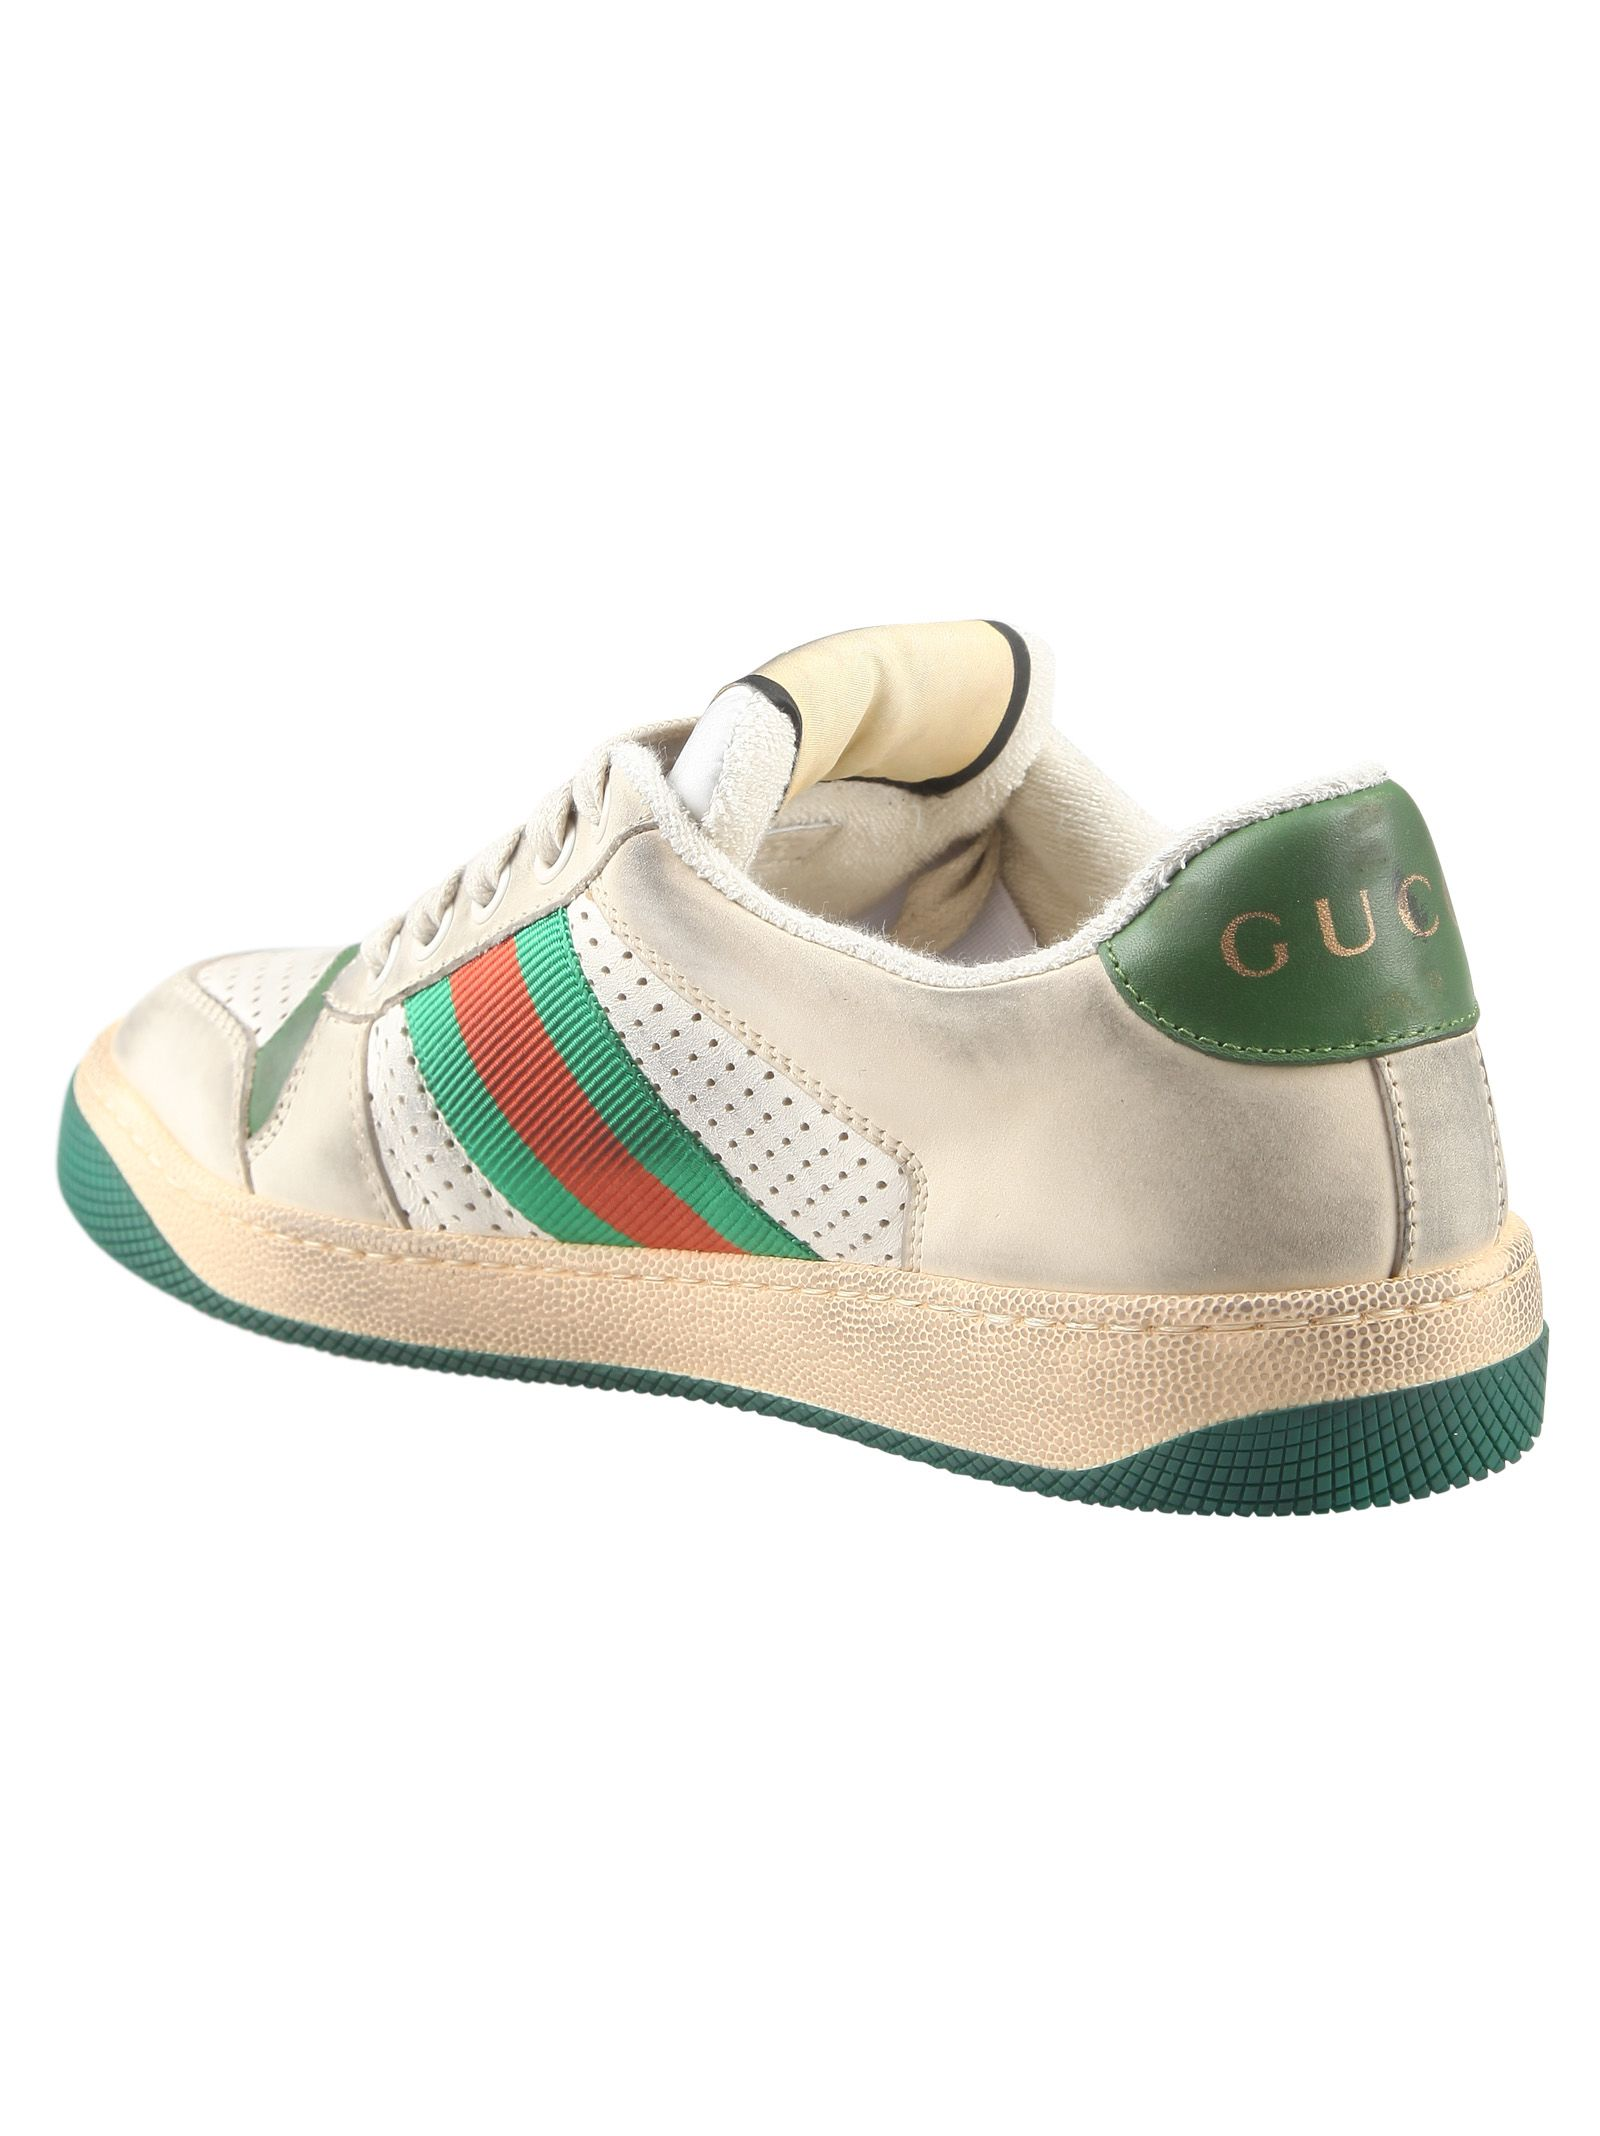 06a366d5c60 Gucci Screener Sneakers - Basic Gucci Screener Sneakers - Basic ...